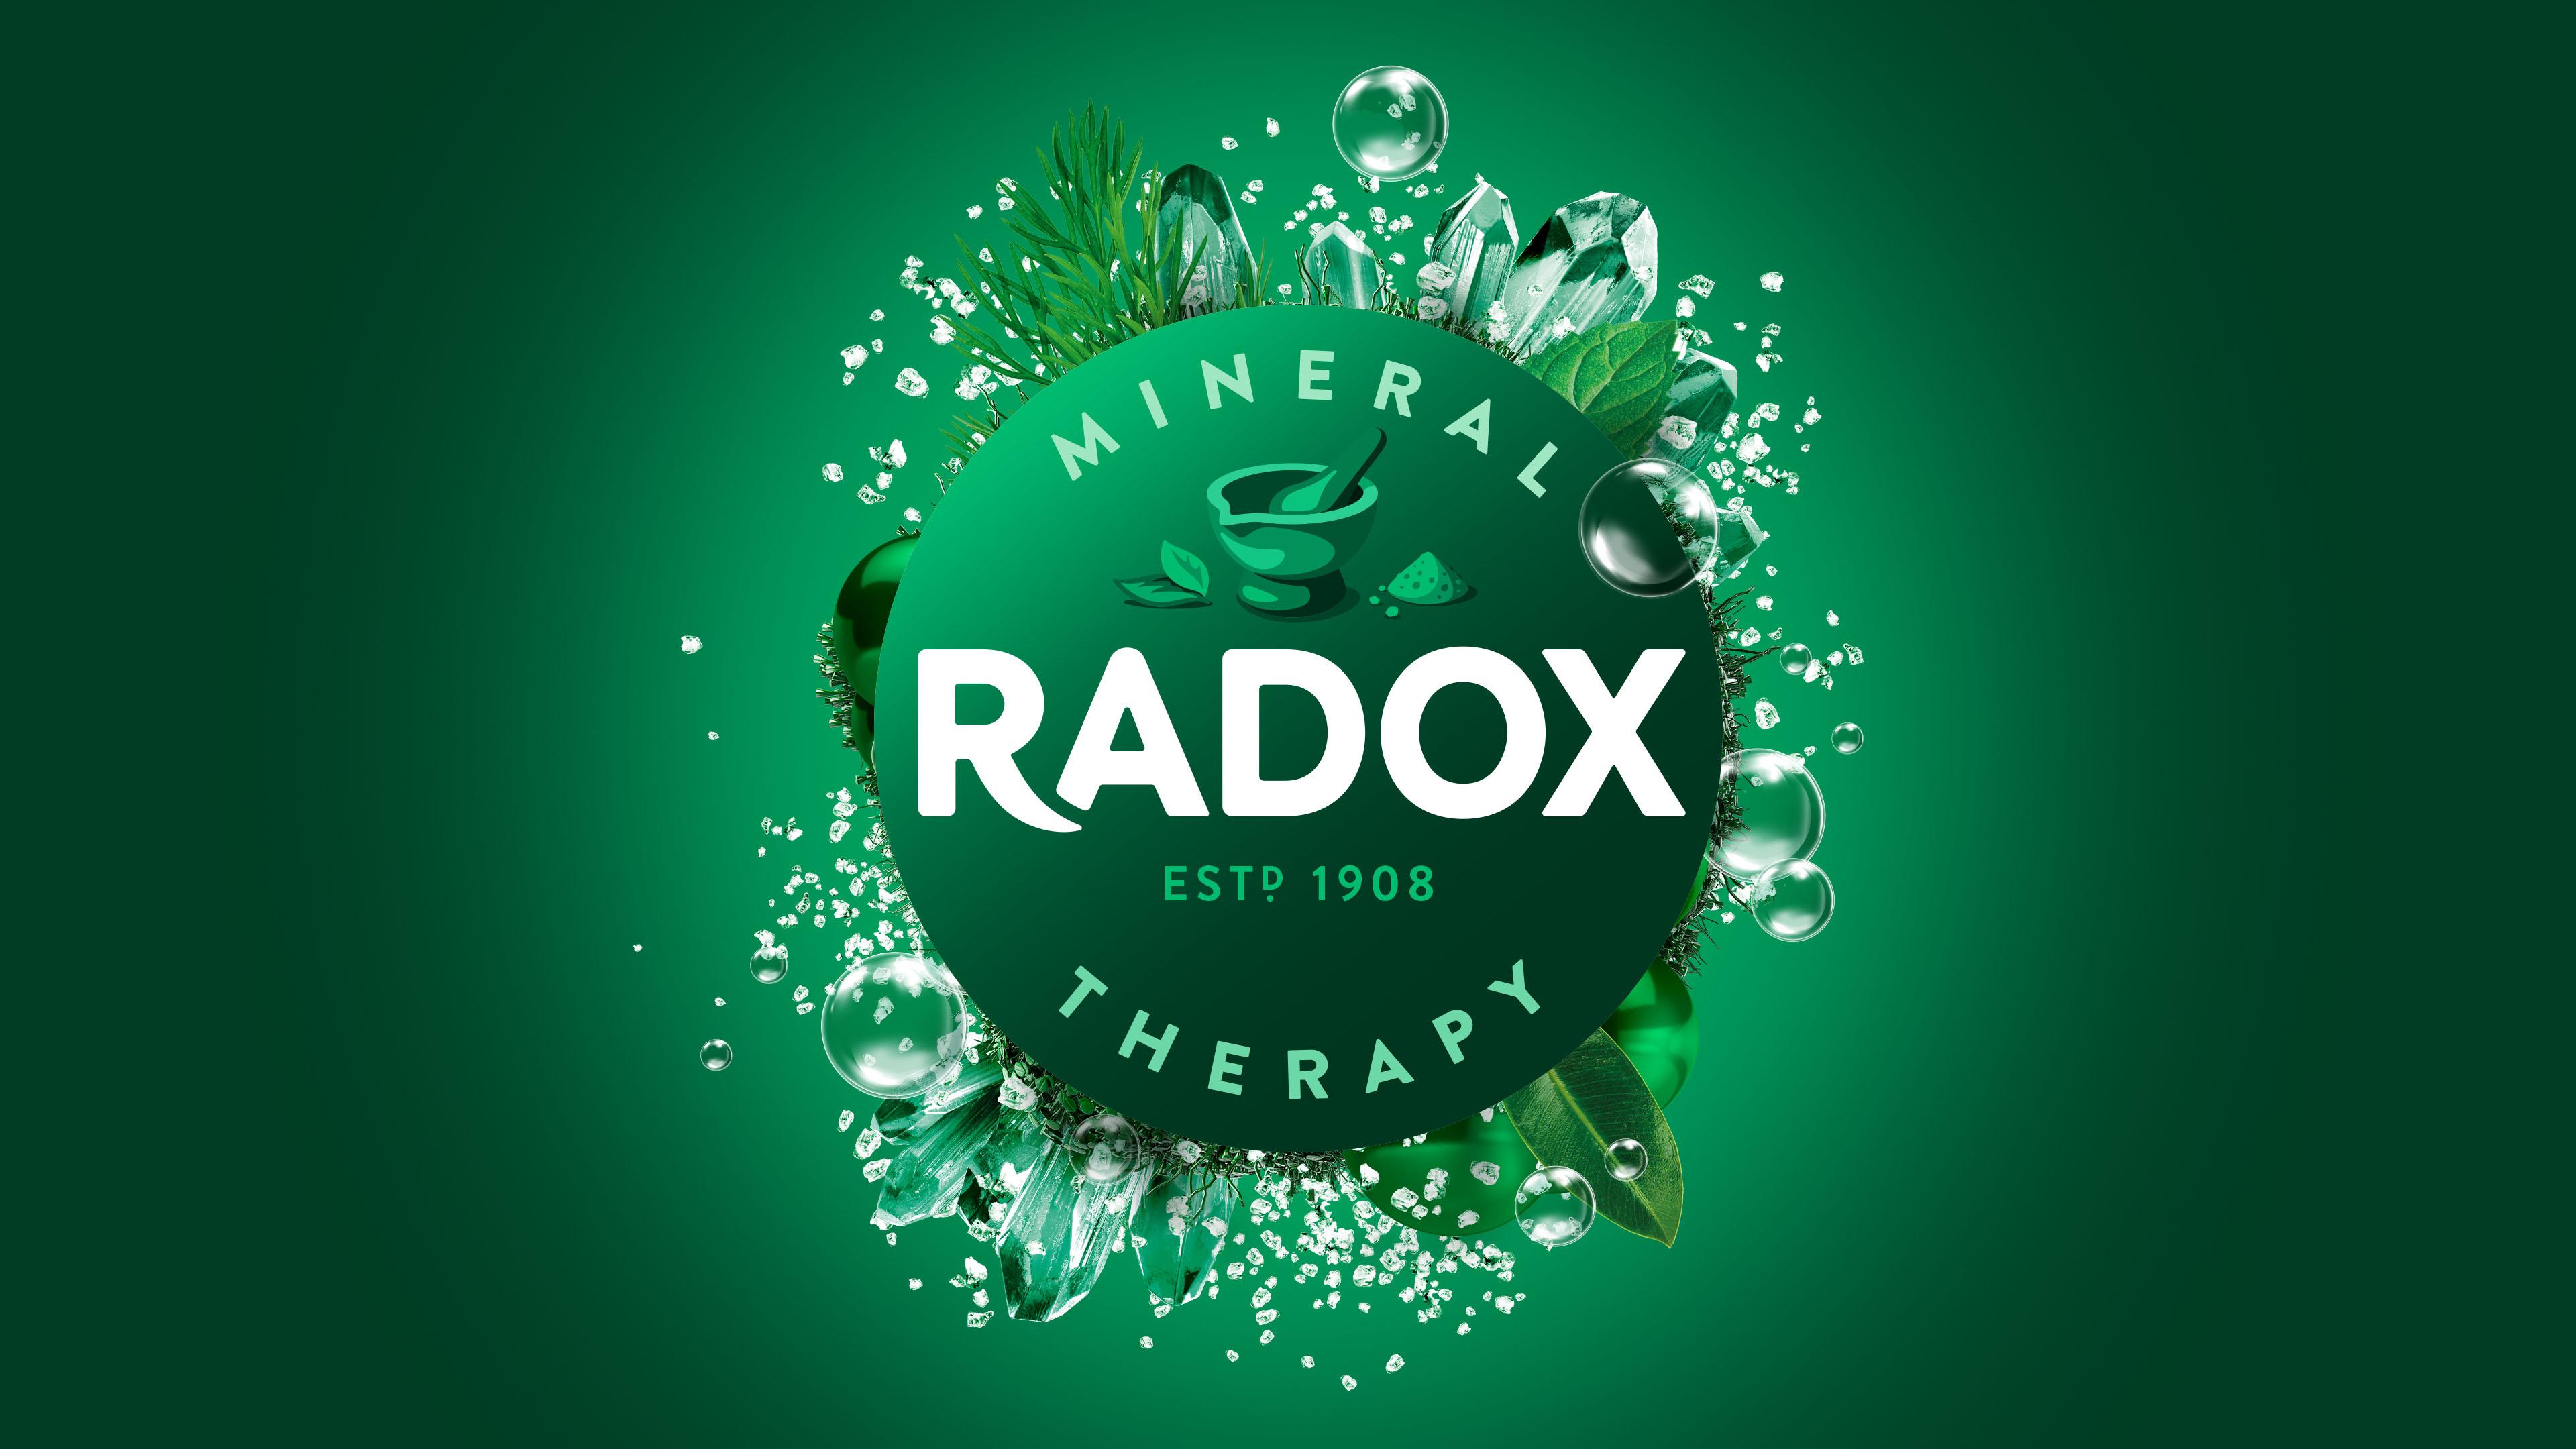 JDO's Redesign Revives Love for Radox